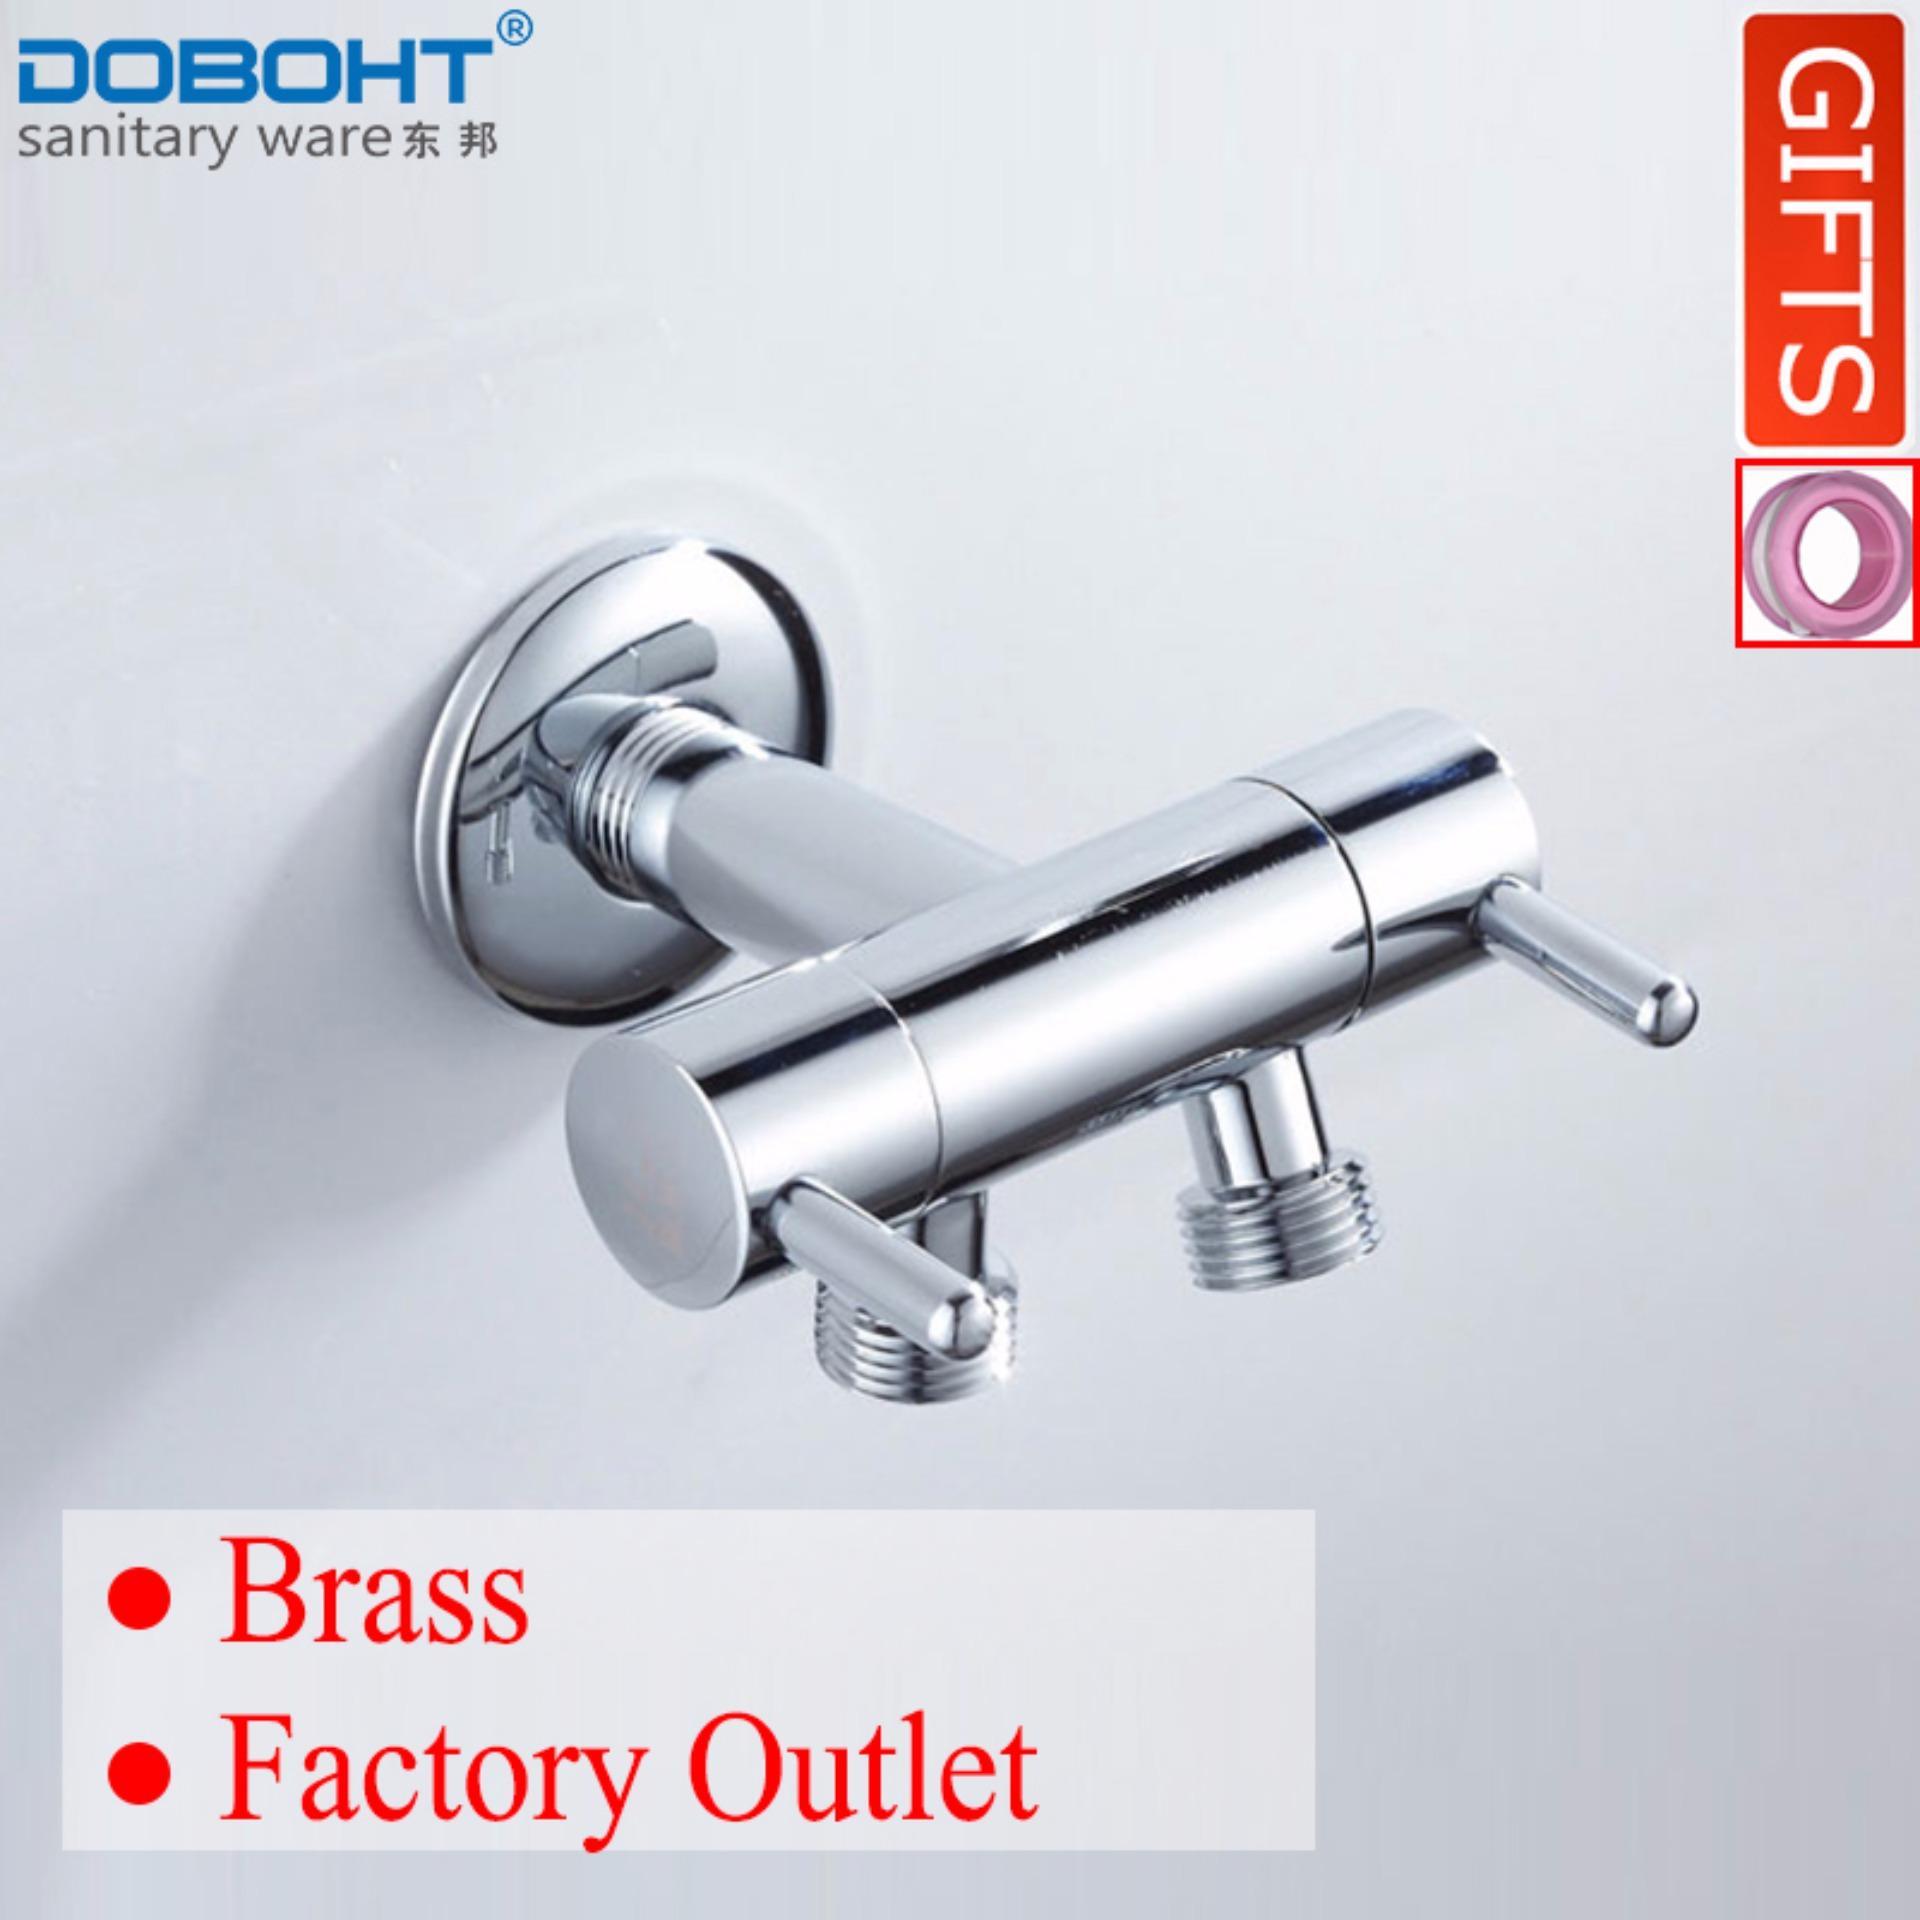 Best Buy Doboht Bathroom Cleaning Brass 2 G1 2 Spout Angle Valve For Toilet Shattaf Chrome Intl